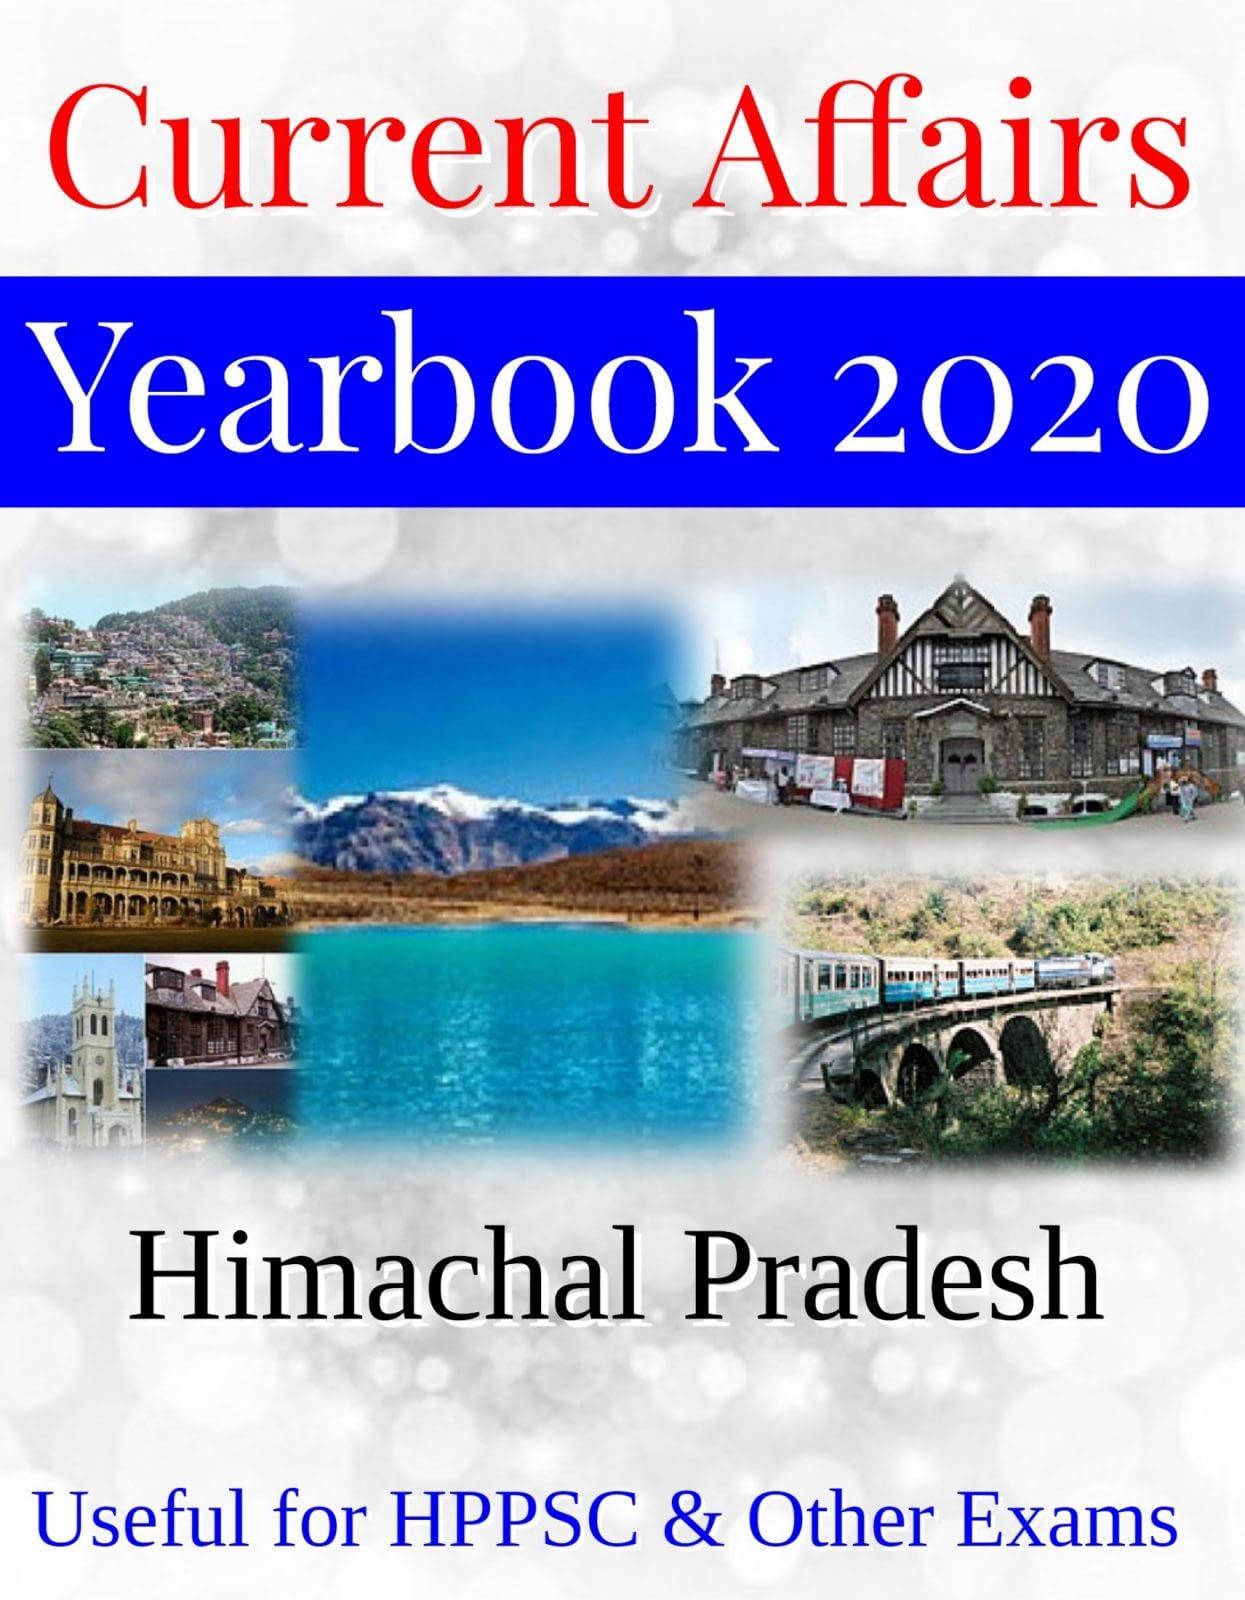 Himachal Pradesh Current Affairs Yearbook 2020